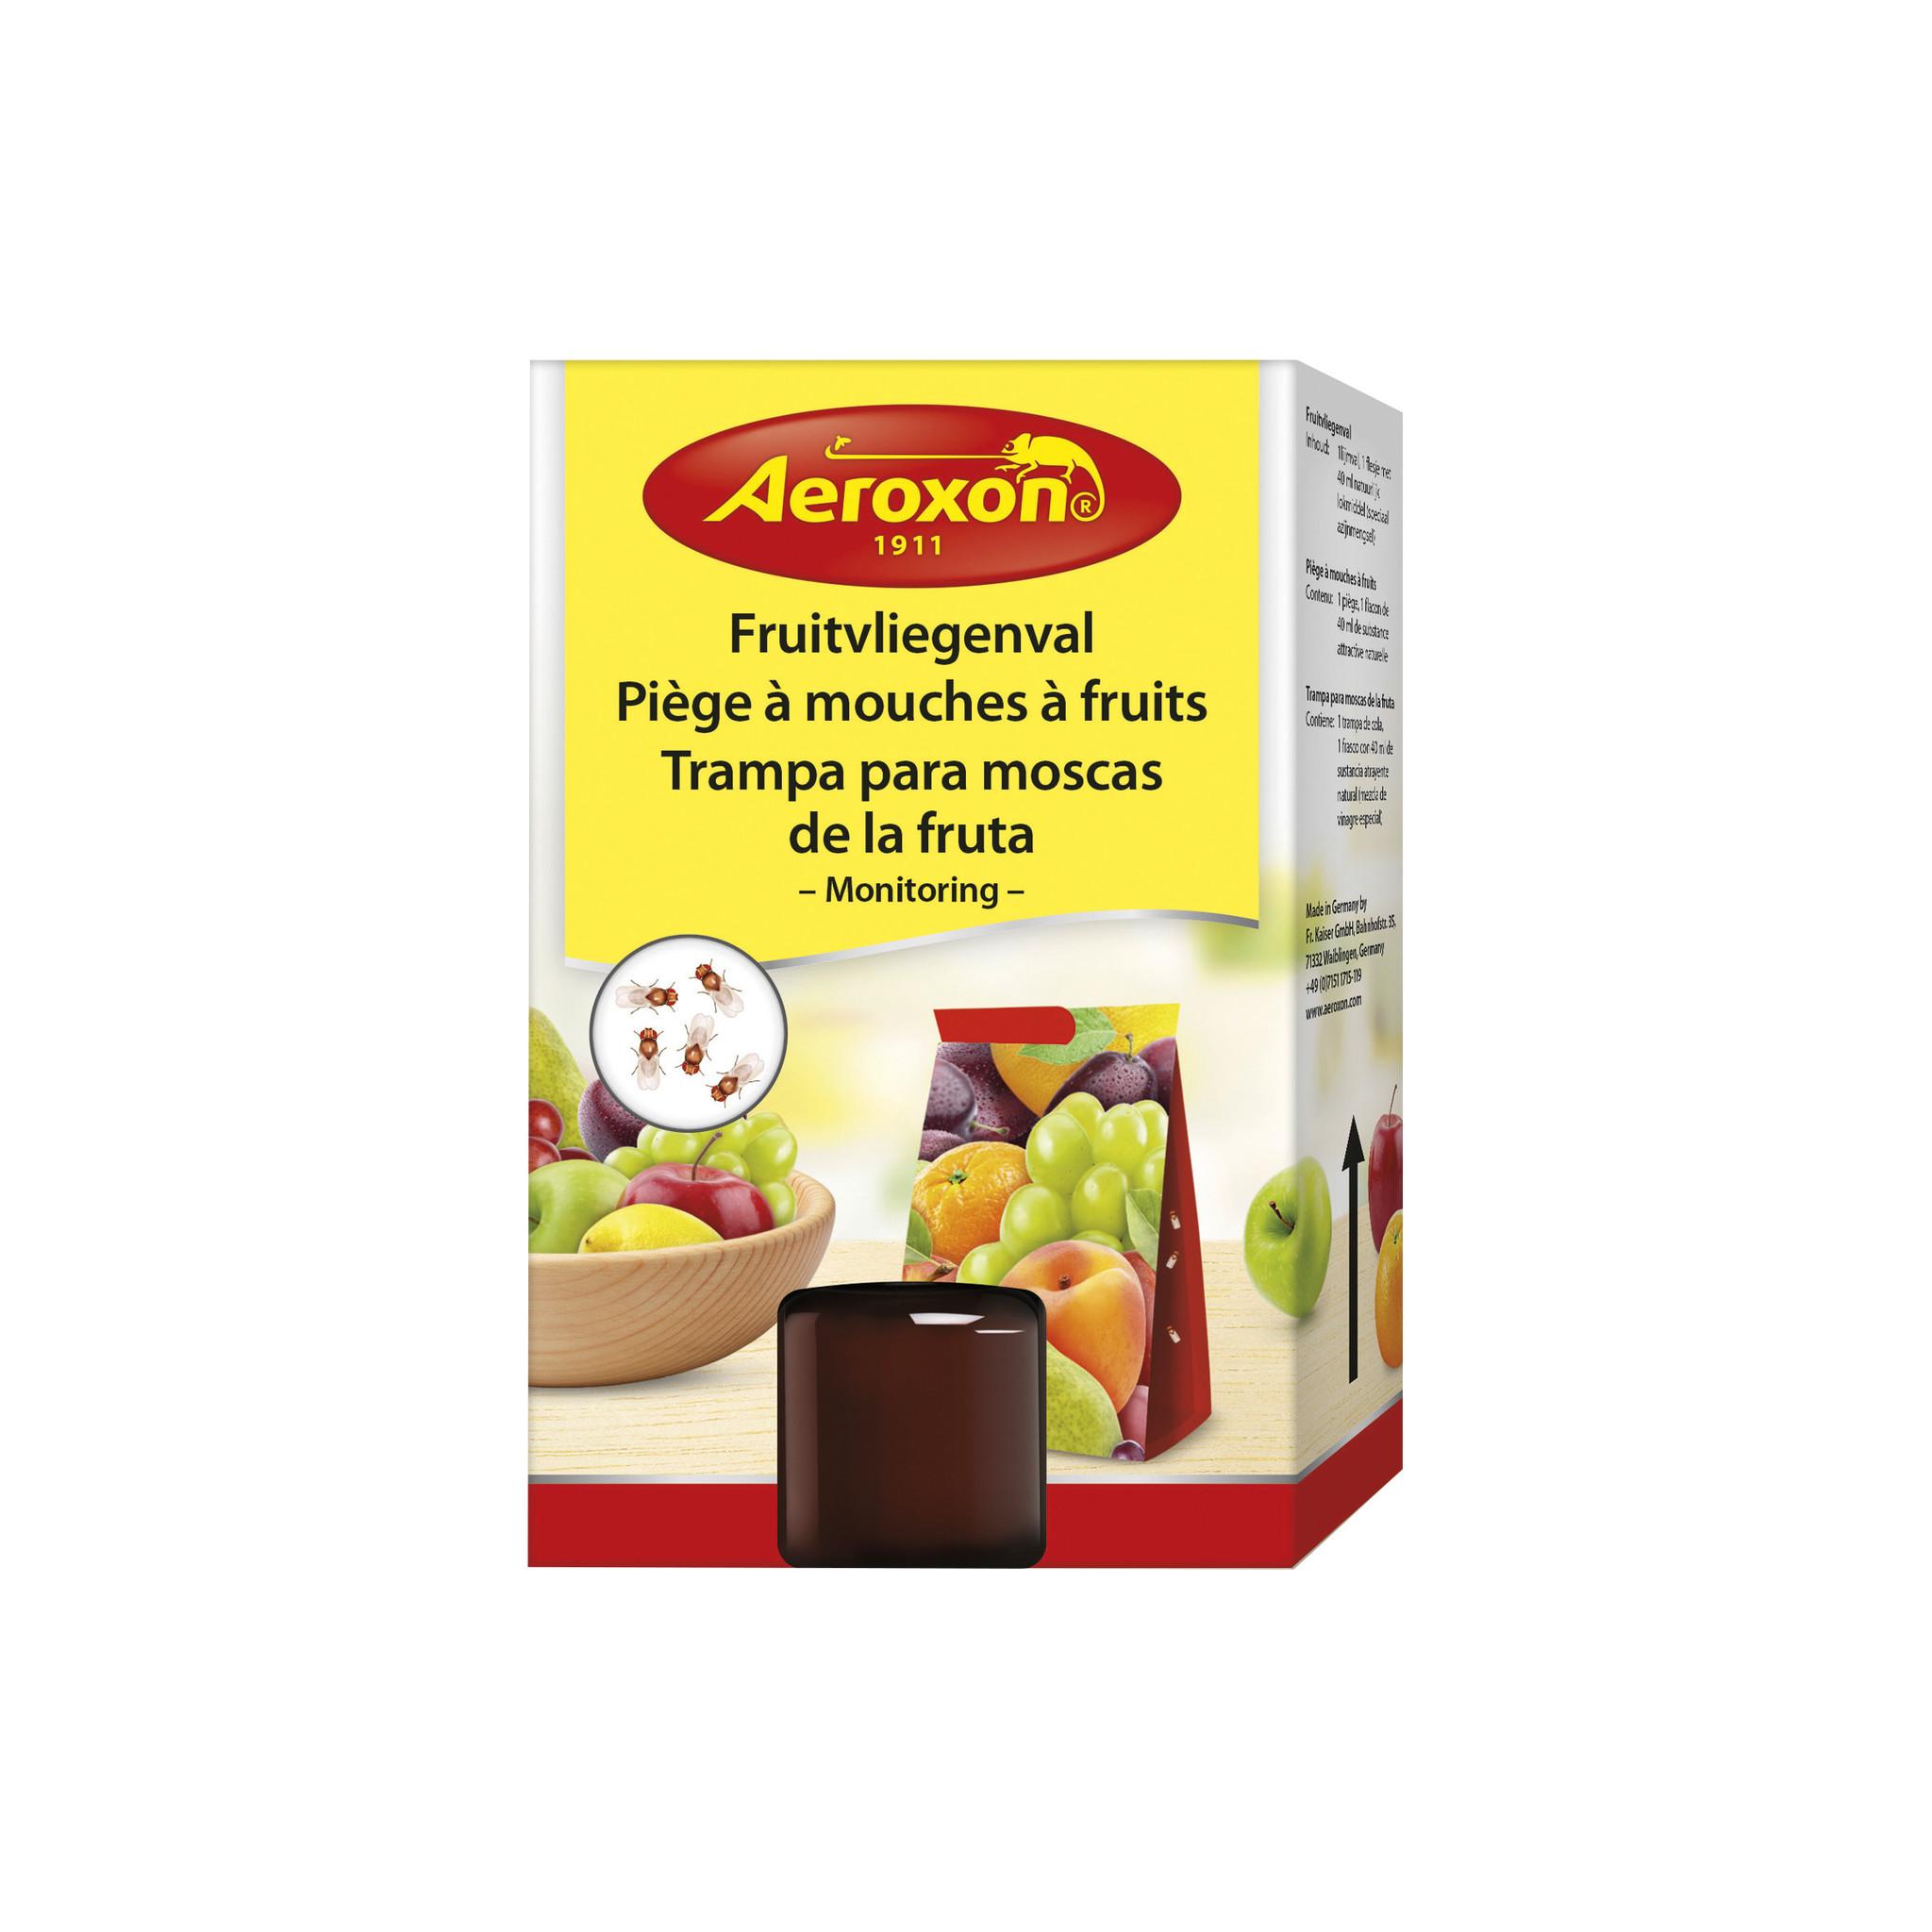 Aeroxon Aeroxon Fruitvliegenval - fruitvliegjes vanger - 40 ml